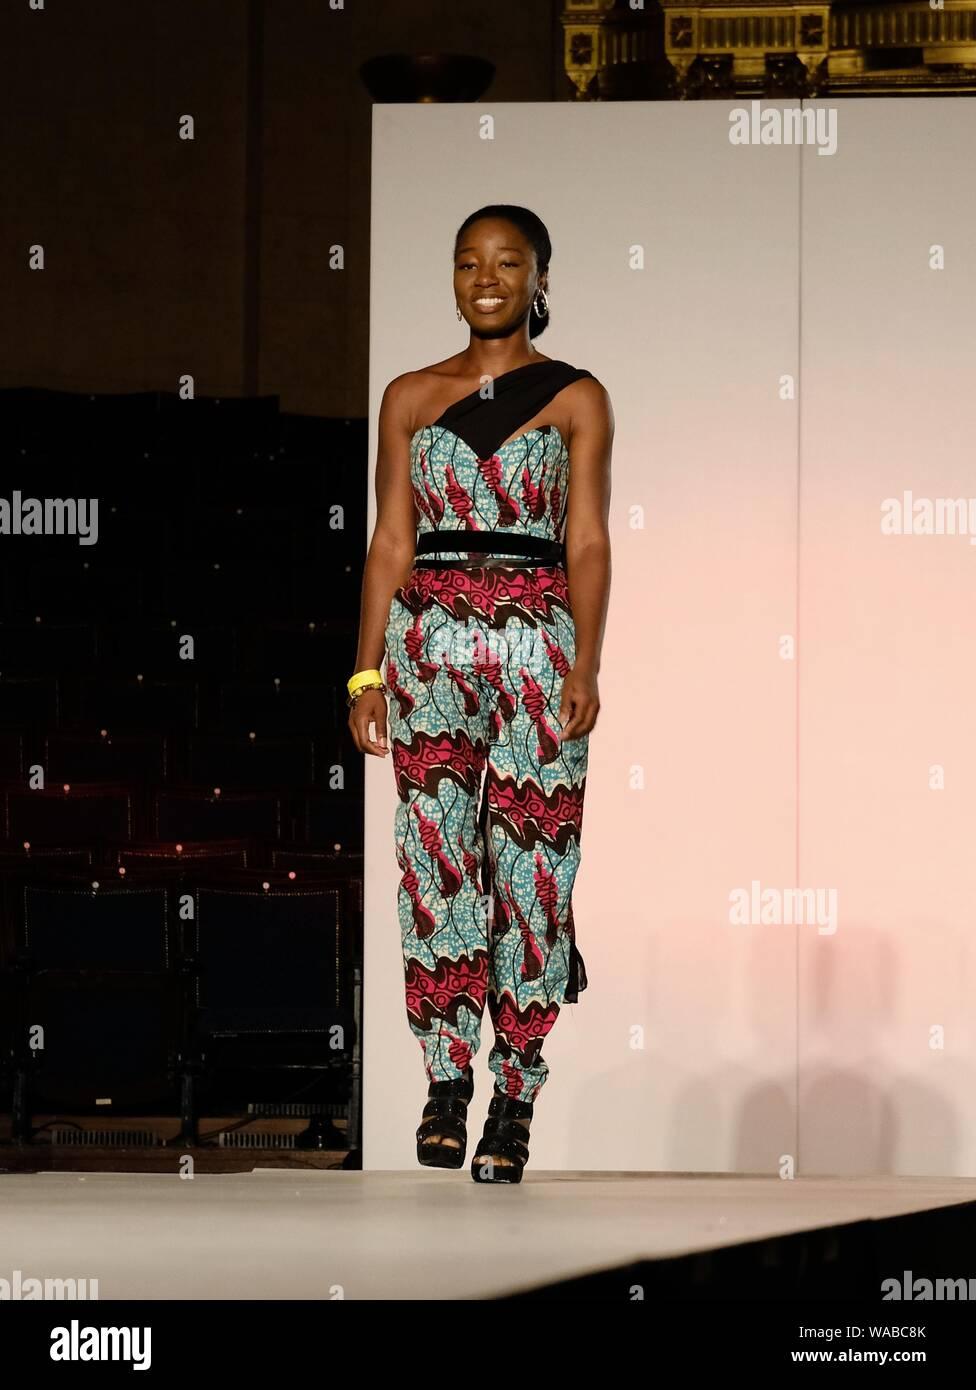 Sherah Designer On The Catwalk At Africa Fashion Week London 2019 Held At The Freemason S Hall Stock Photo Alamy